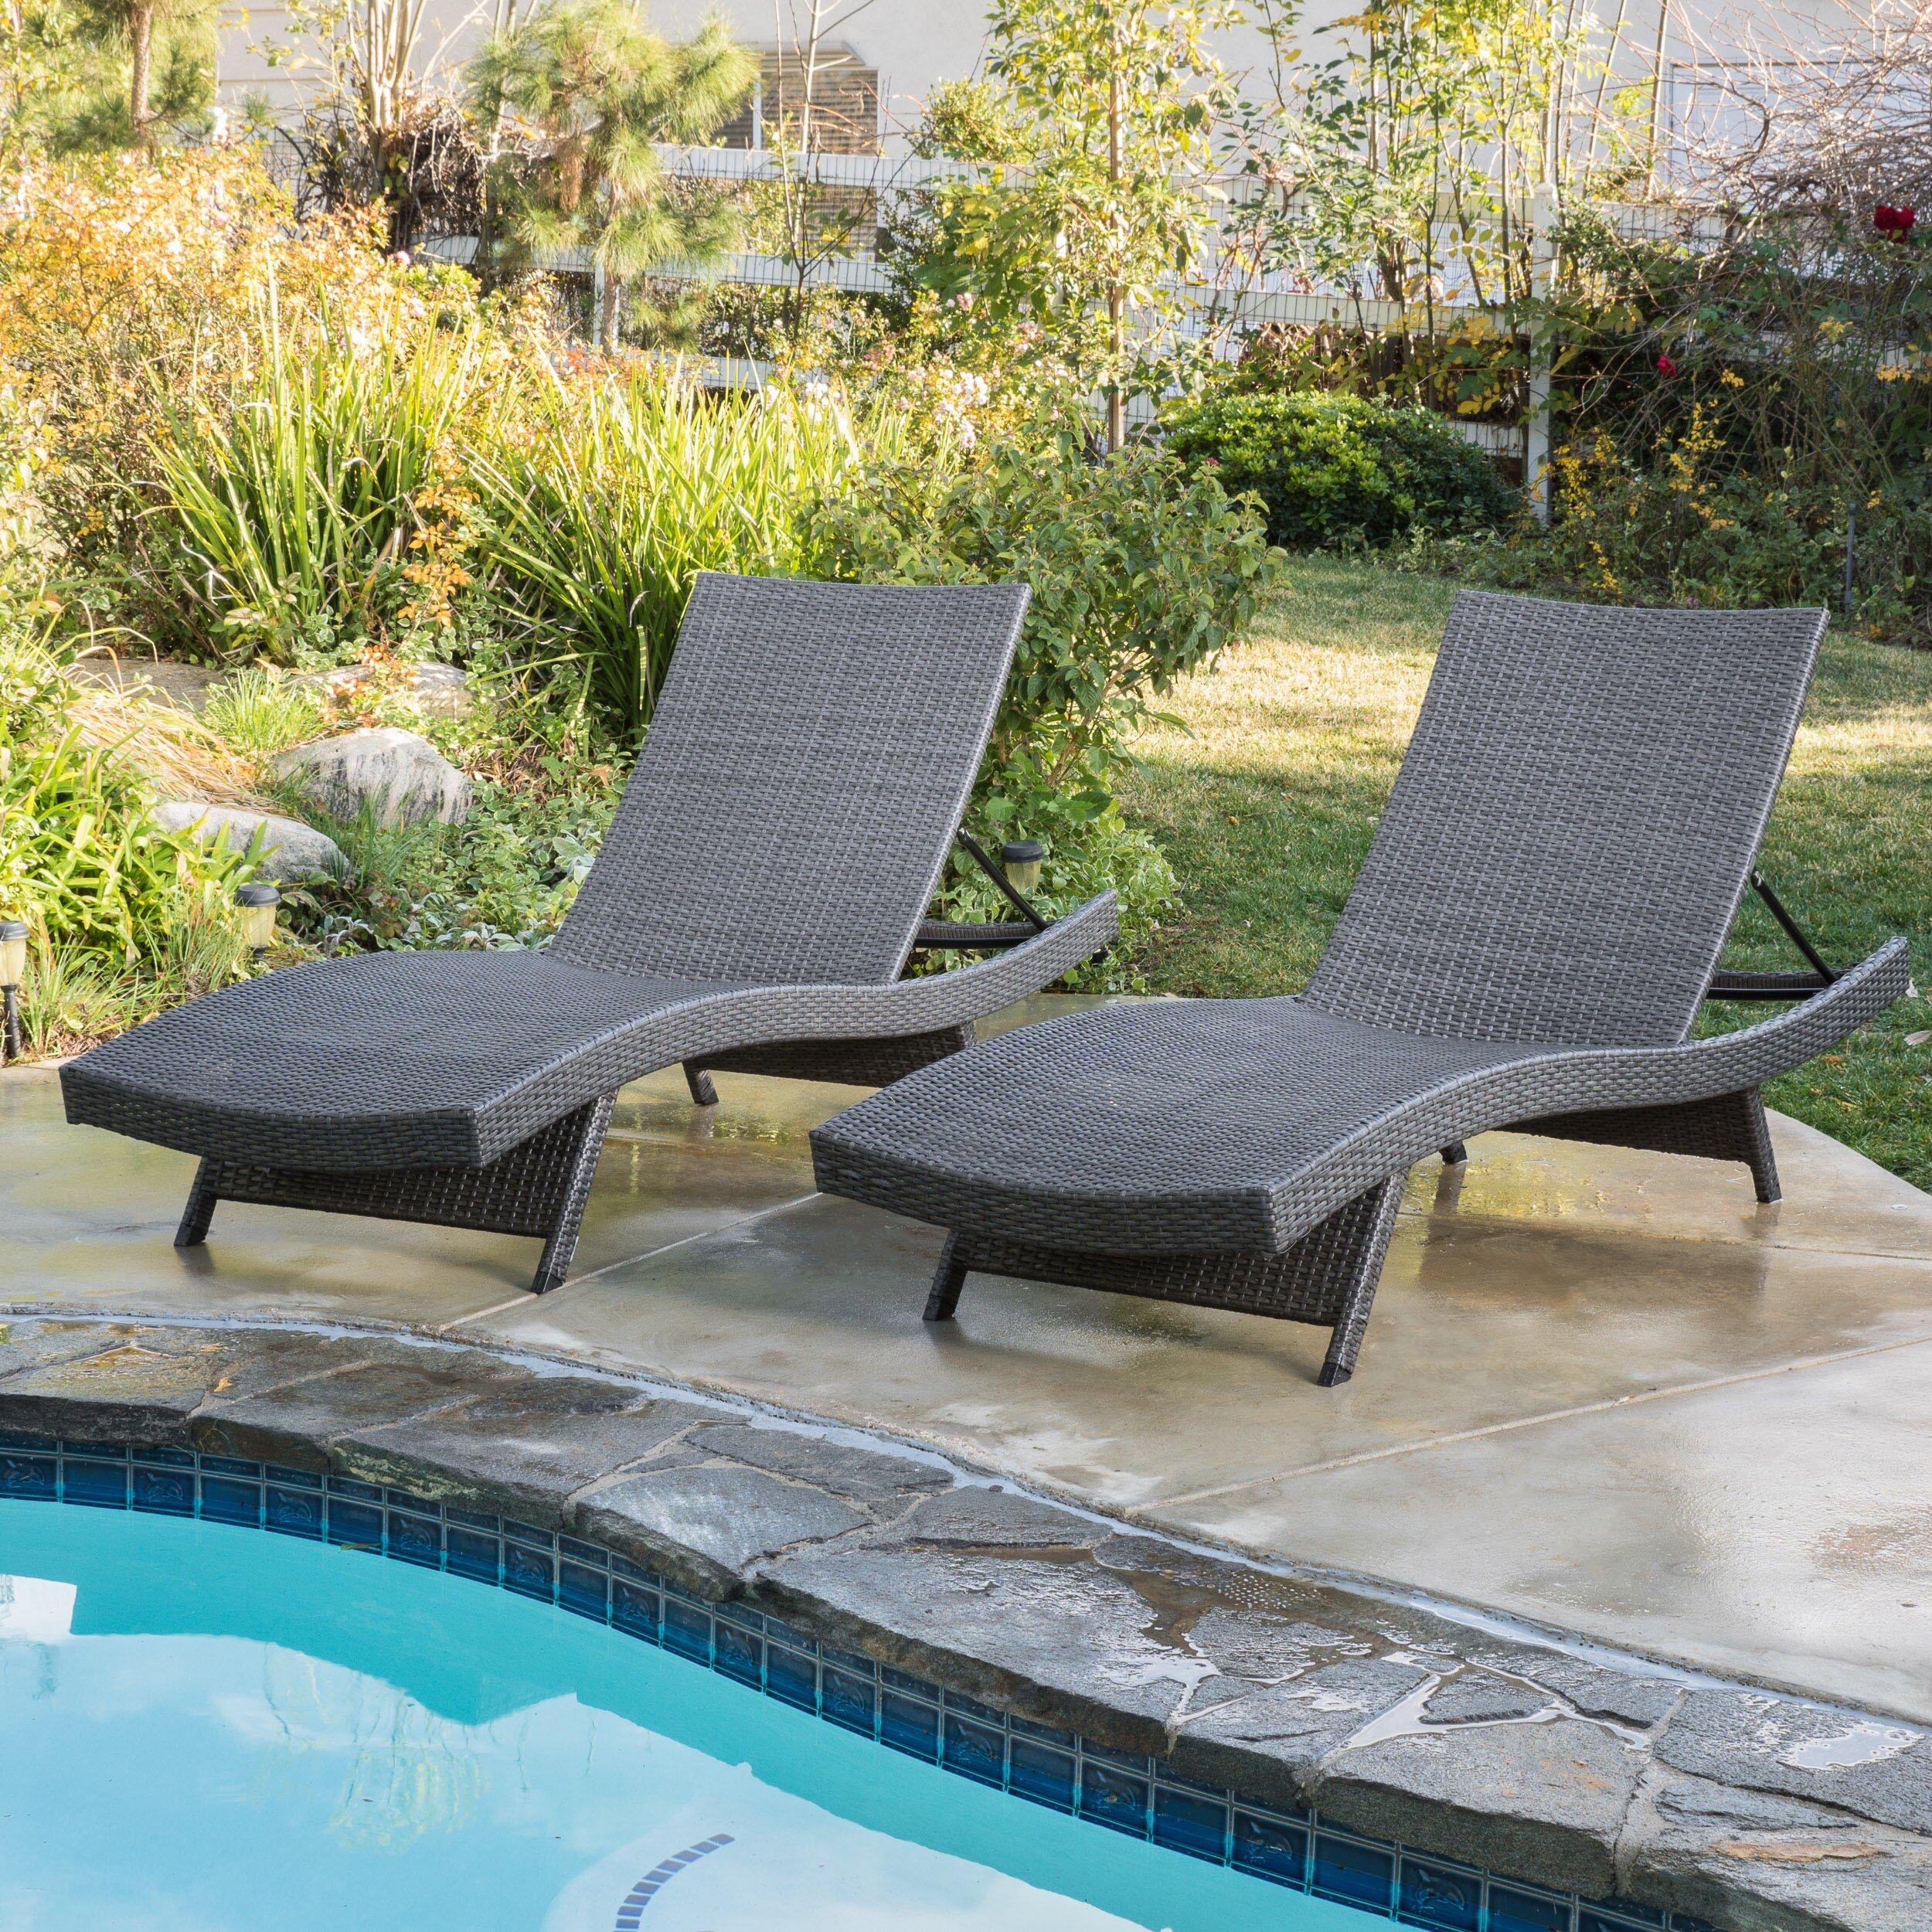 Brayden Studio Gadbois Adjustable Chaise Lounge Reviews Wayfair